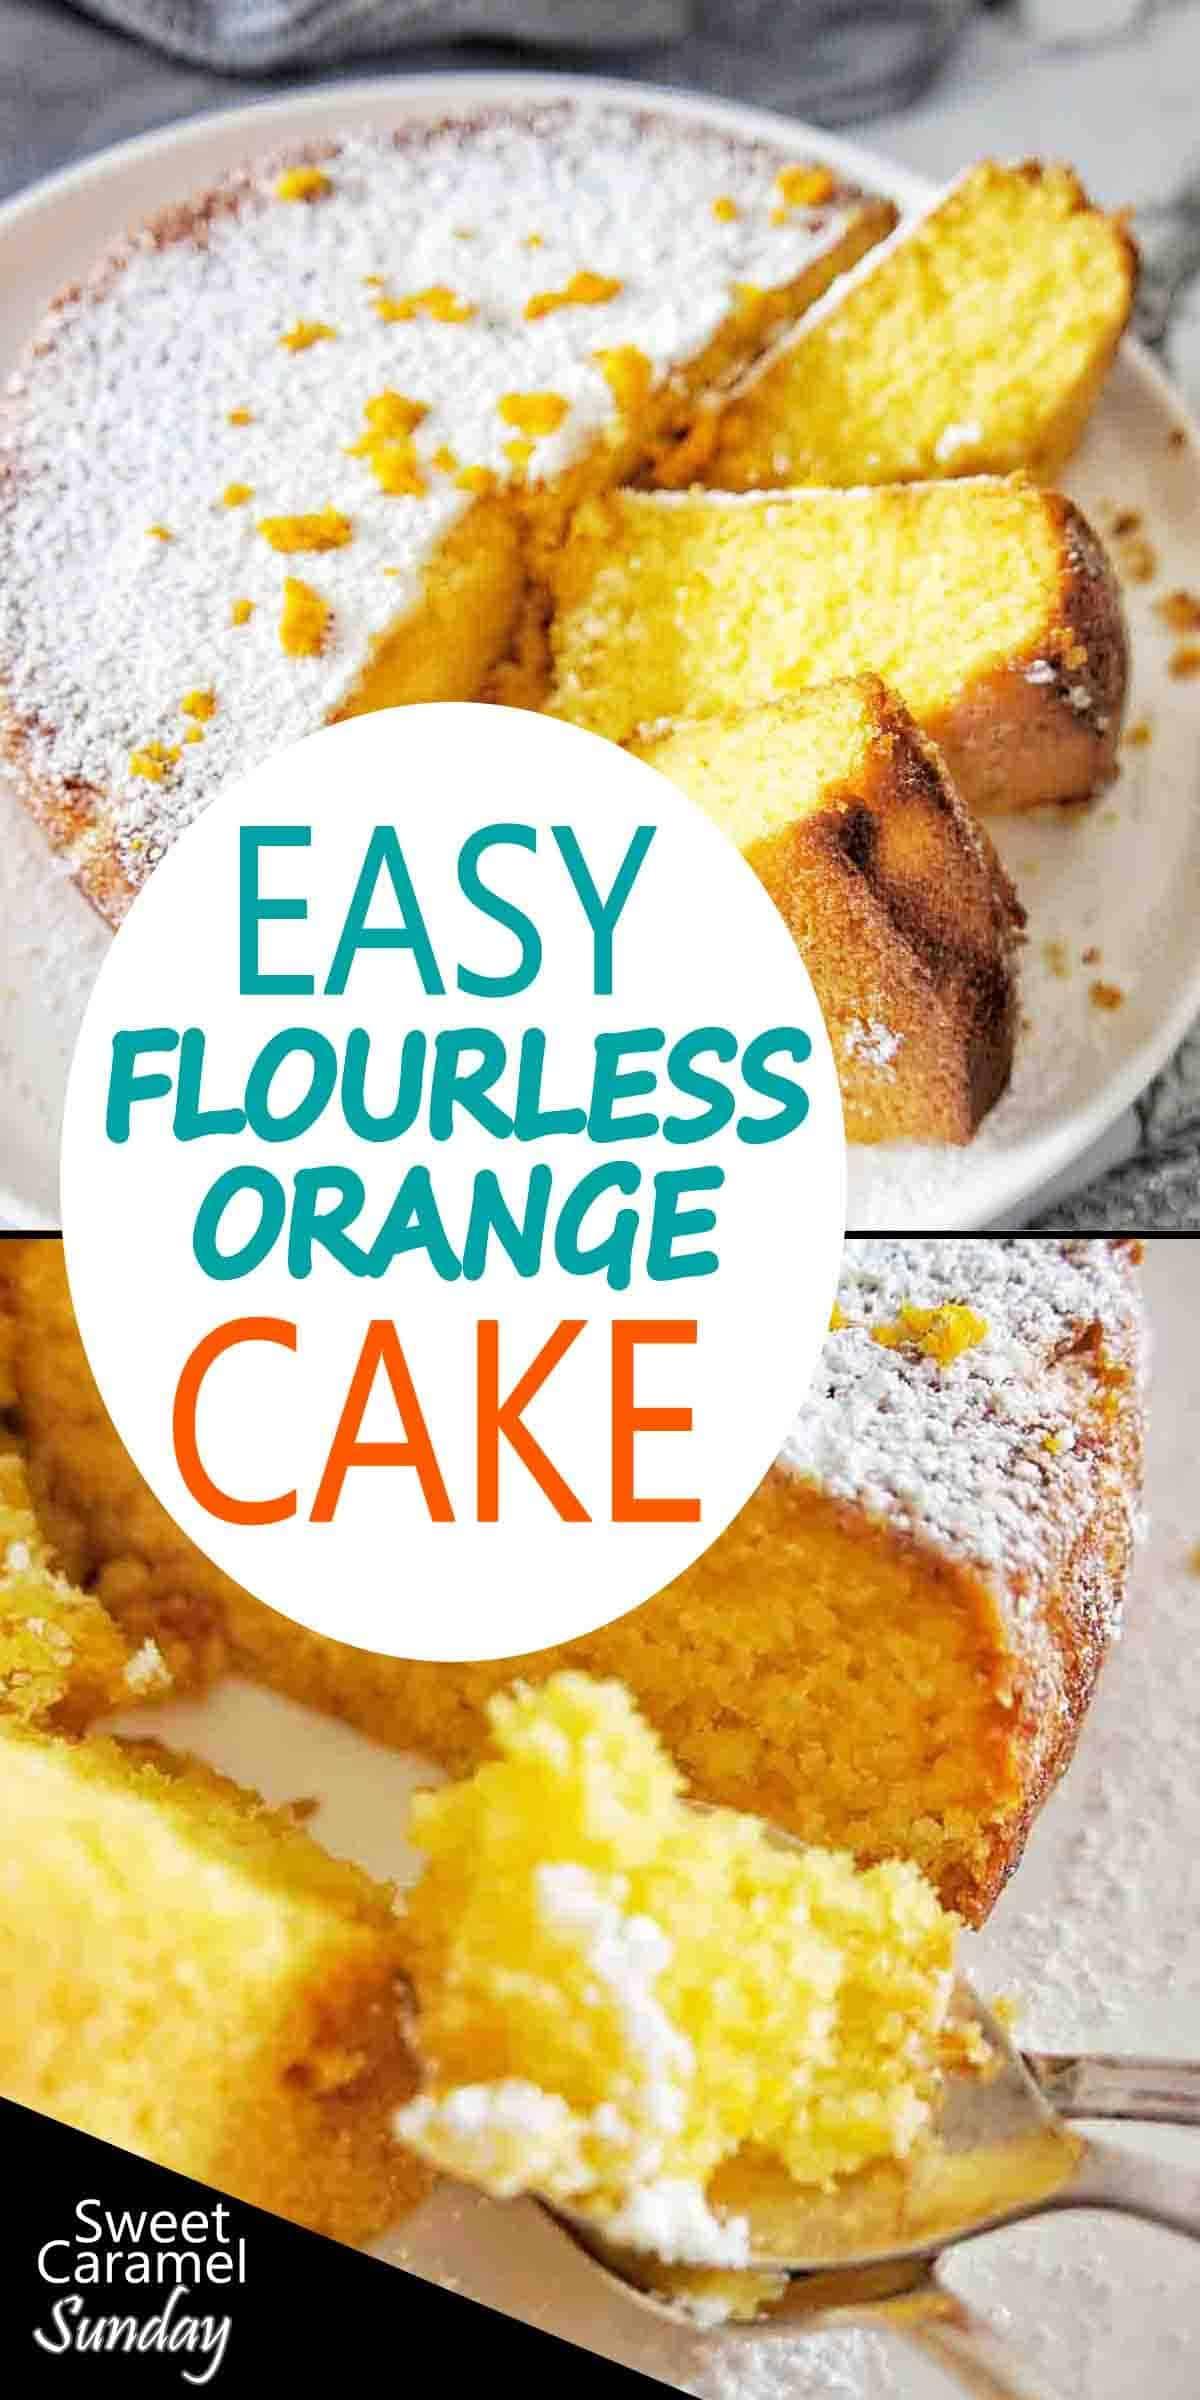 Easy Flourless Orange Cake with text overlay